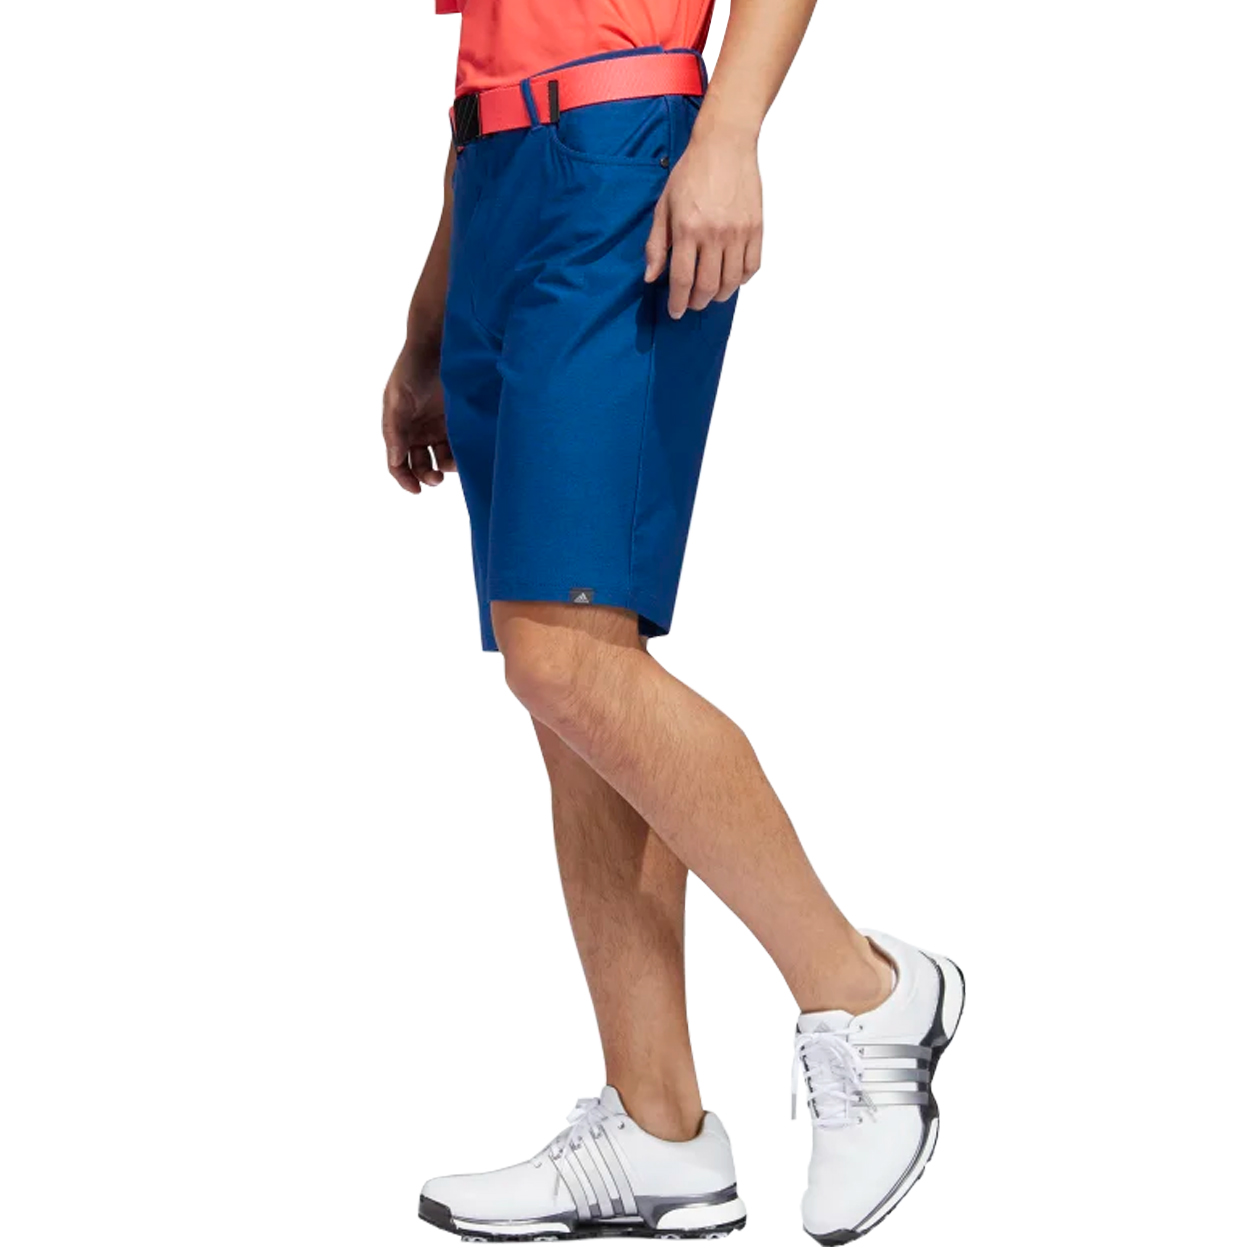 Adidas-Golf-Men-039-s-Ultimate365-Heather-5-Pocket-Shorts-Brand-New thumbnail 6